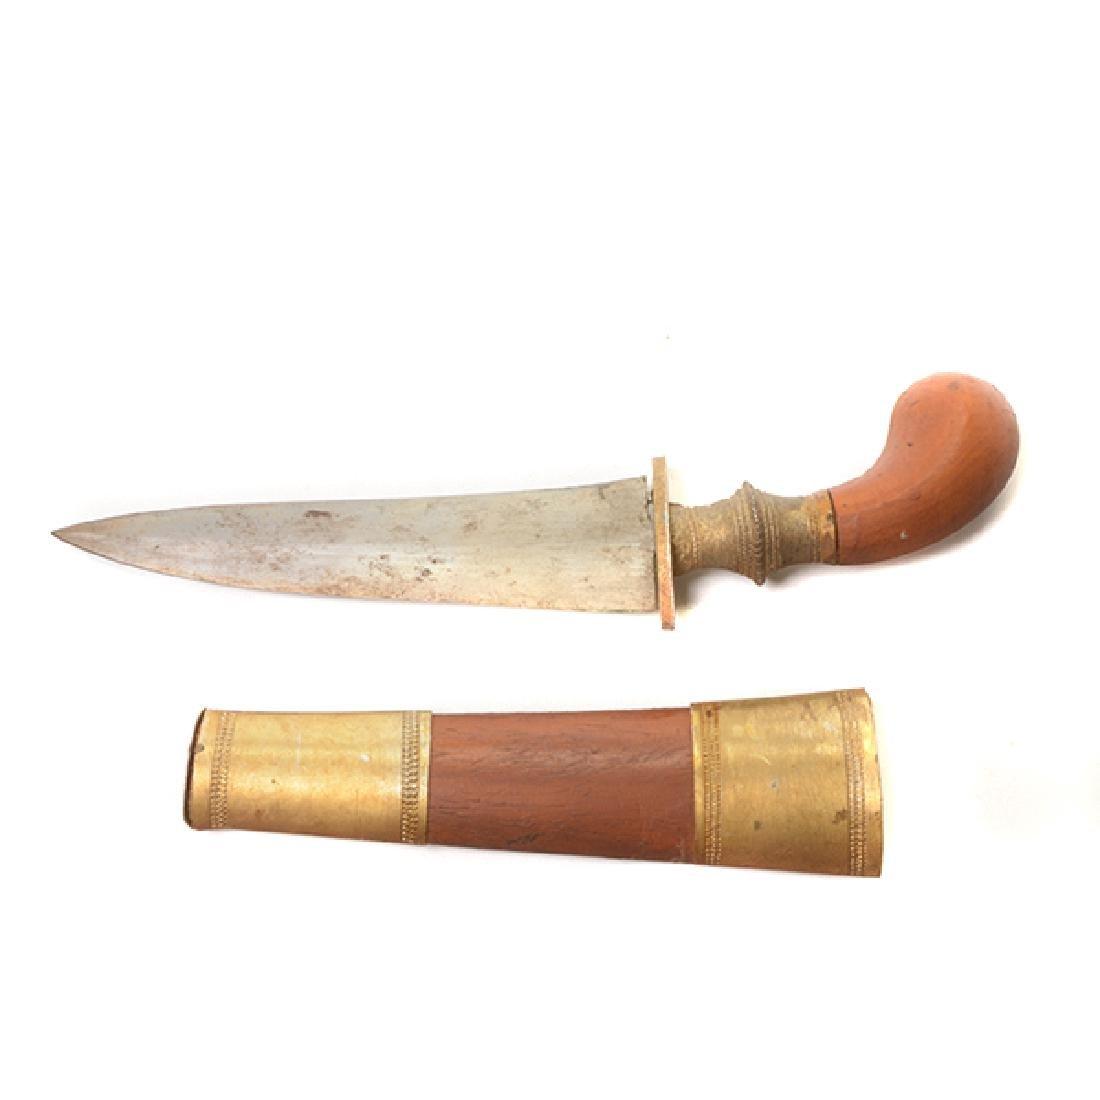 Seven Handmade Daggers and an Indian Shield - 6